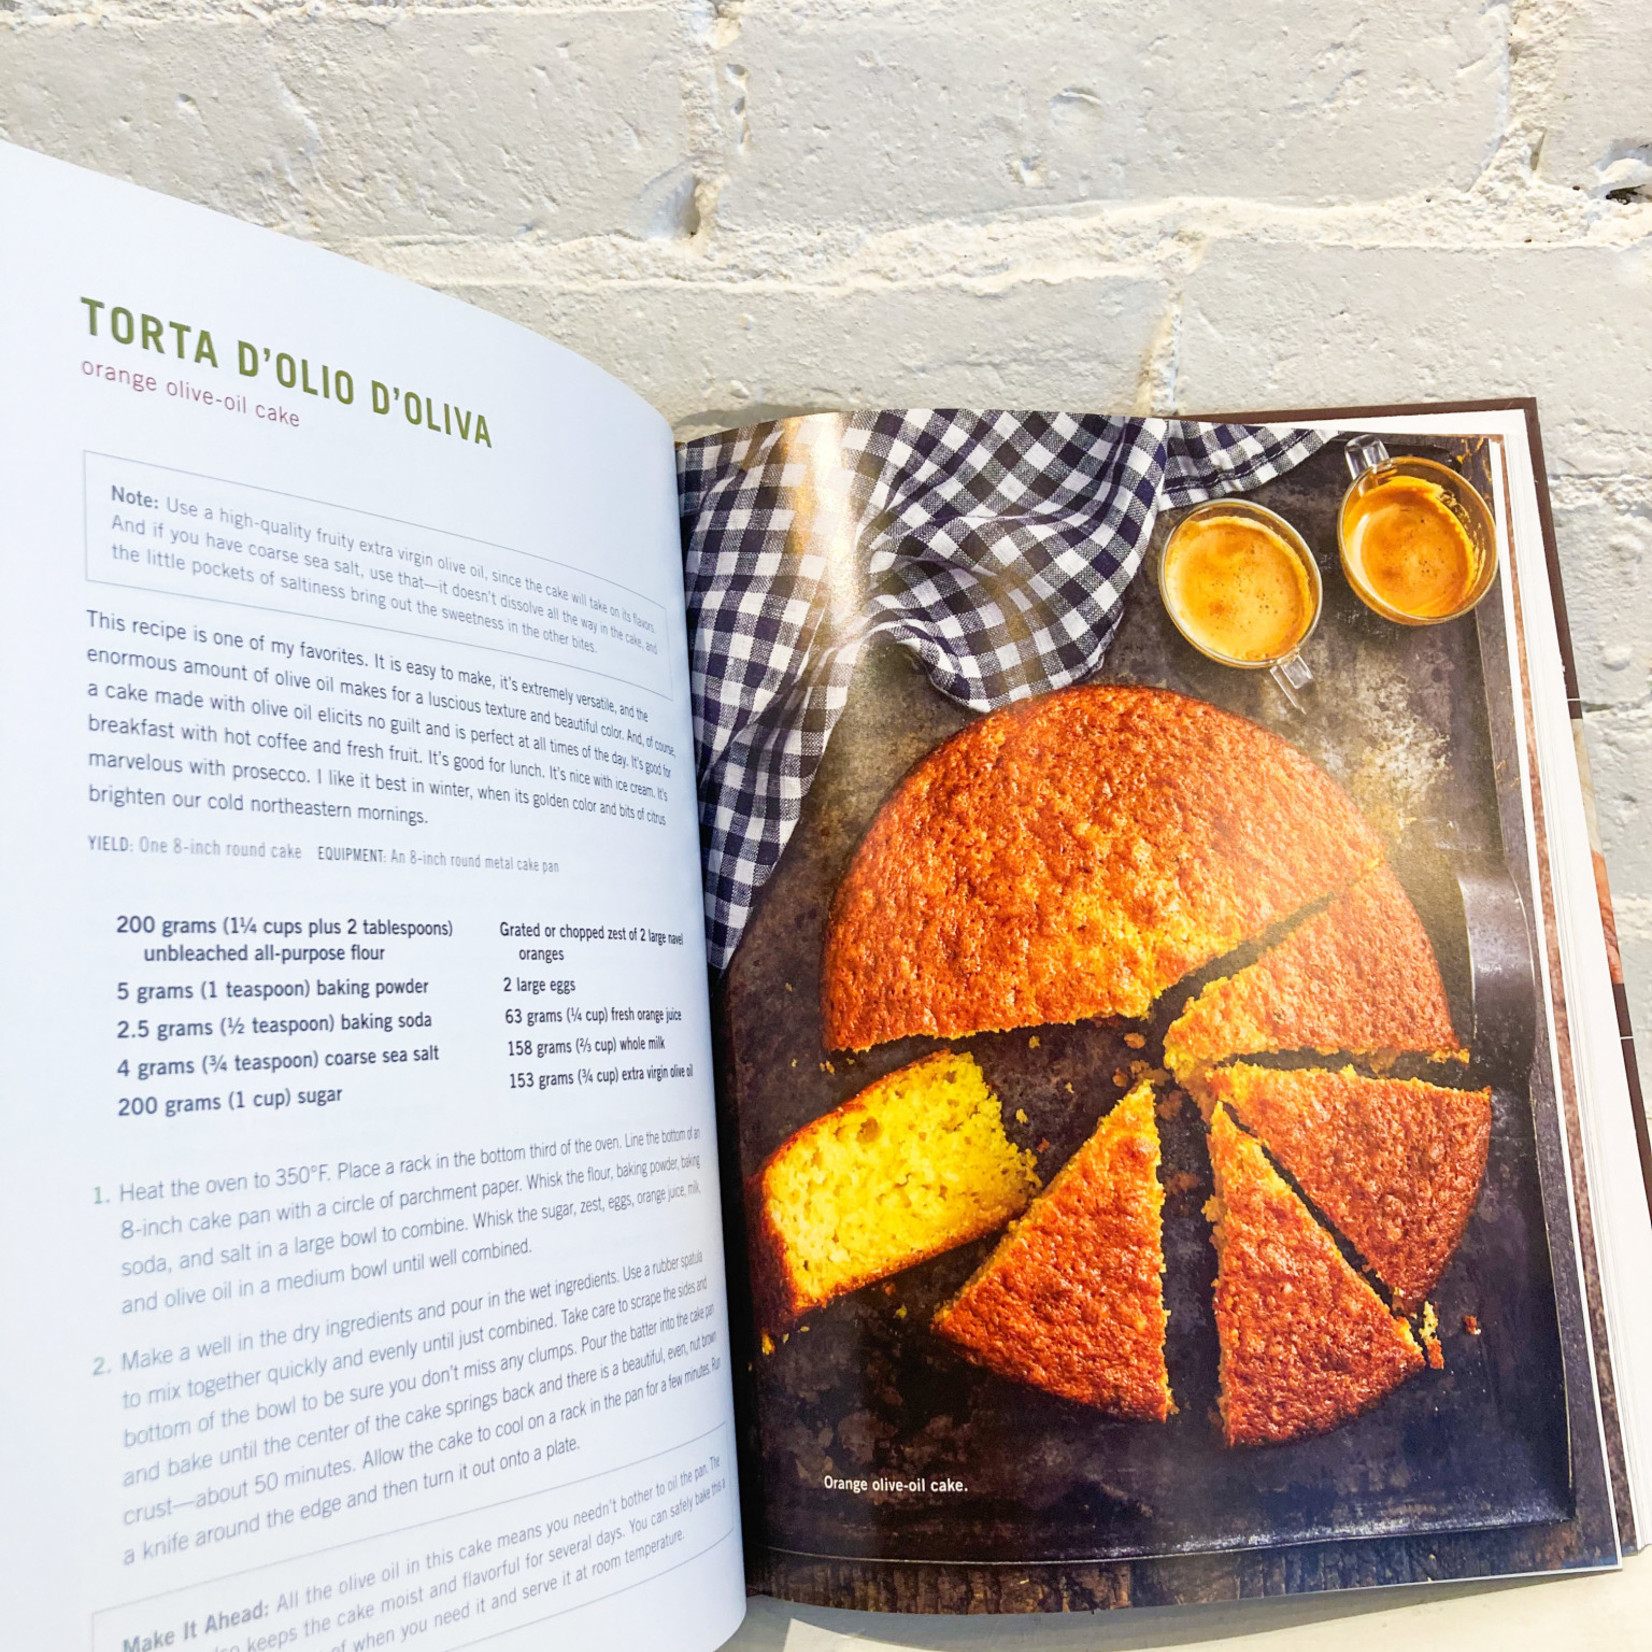 The Sullivan Street Bakery Cookbook by Jim Lahey